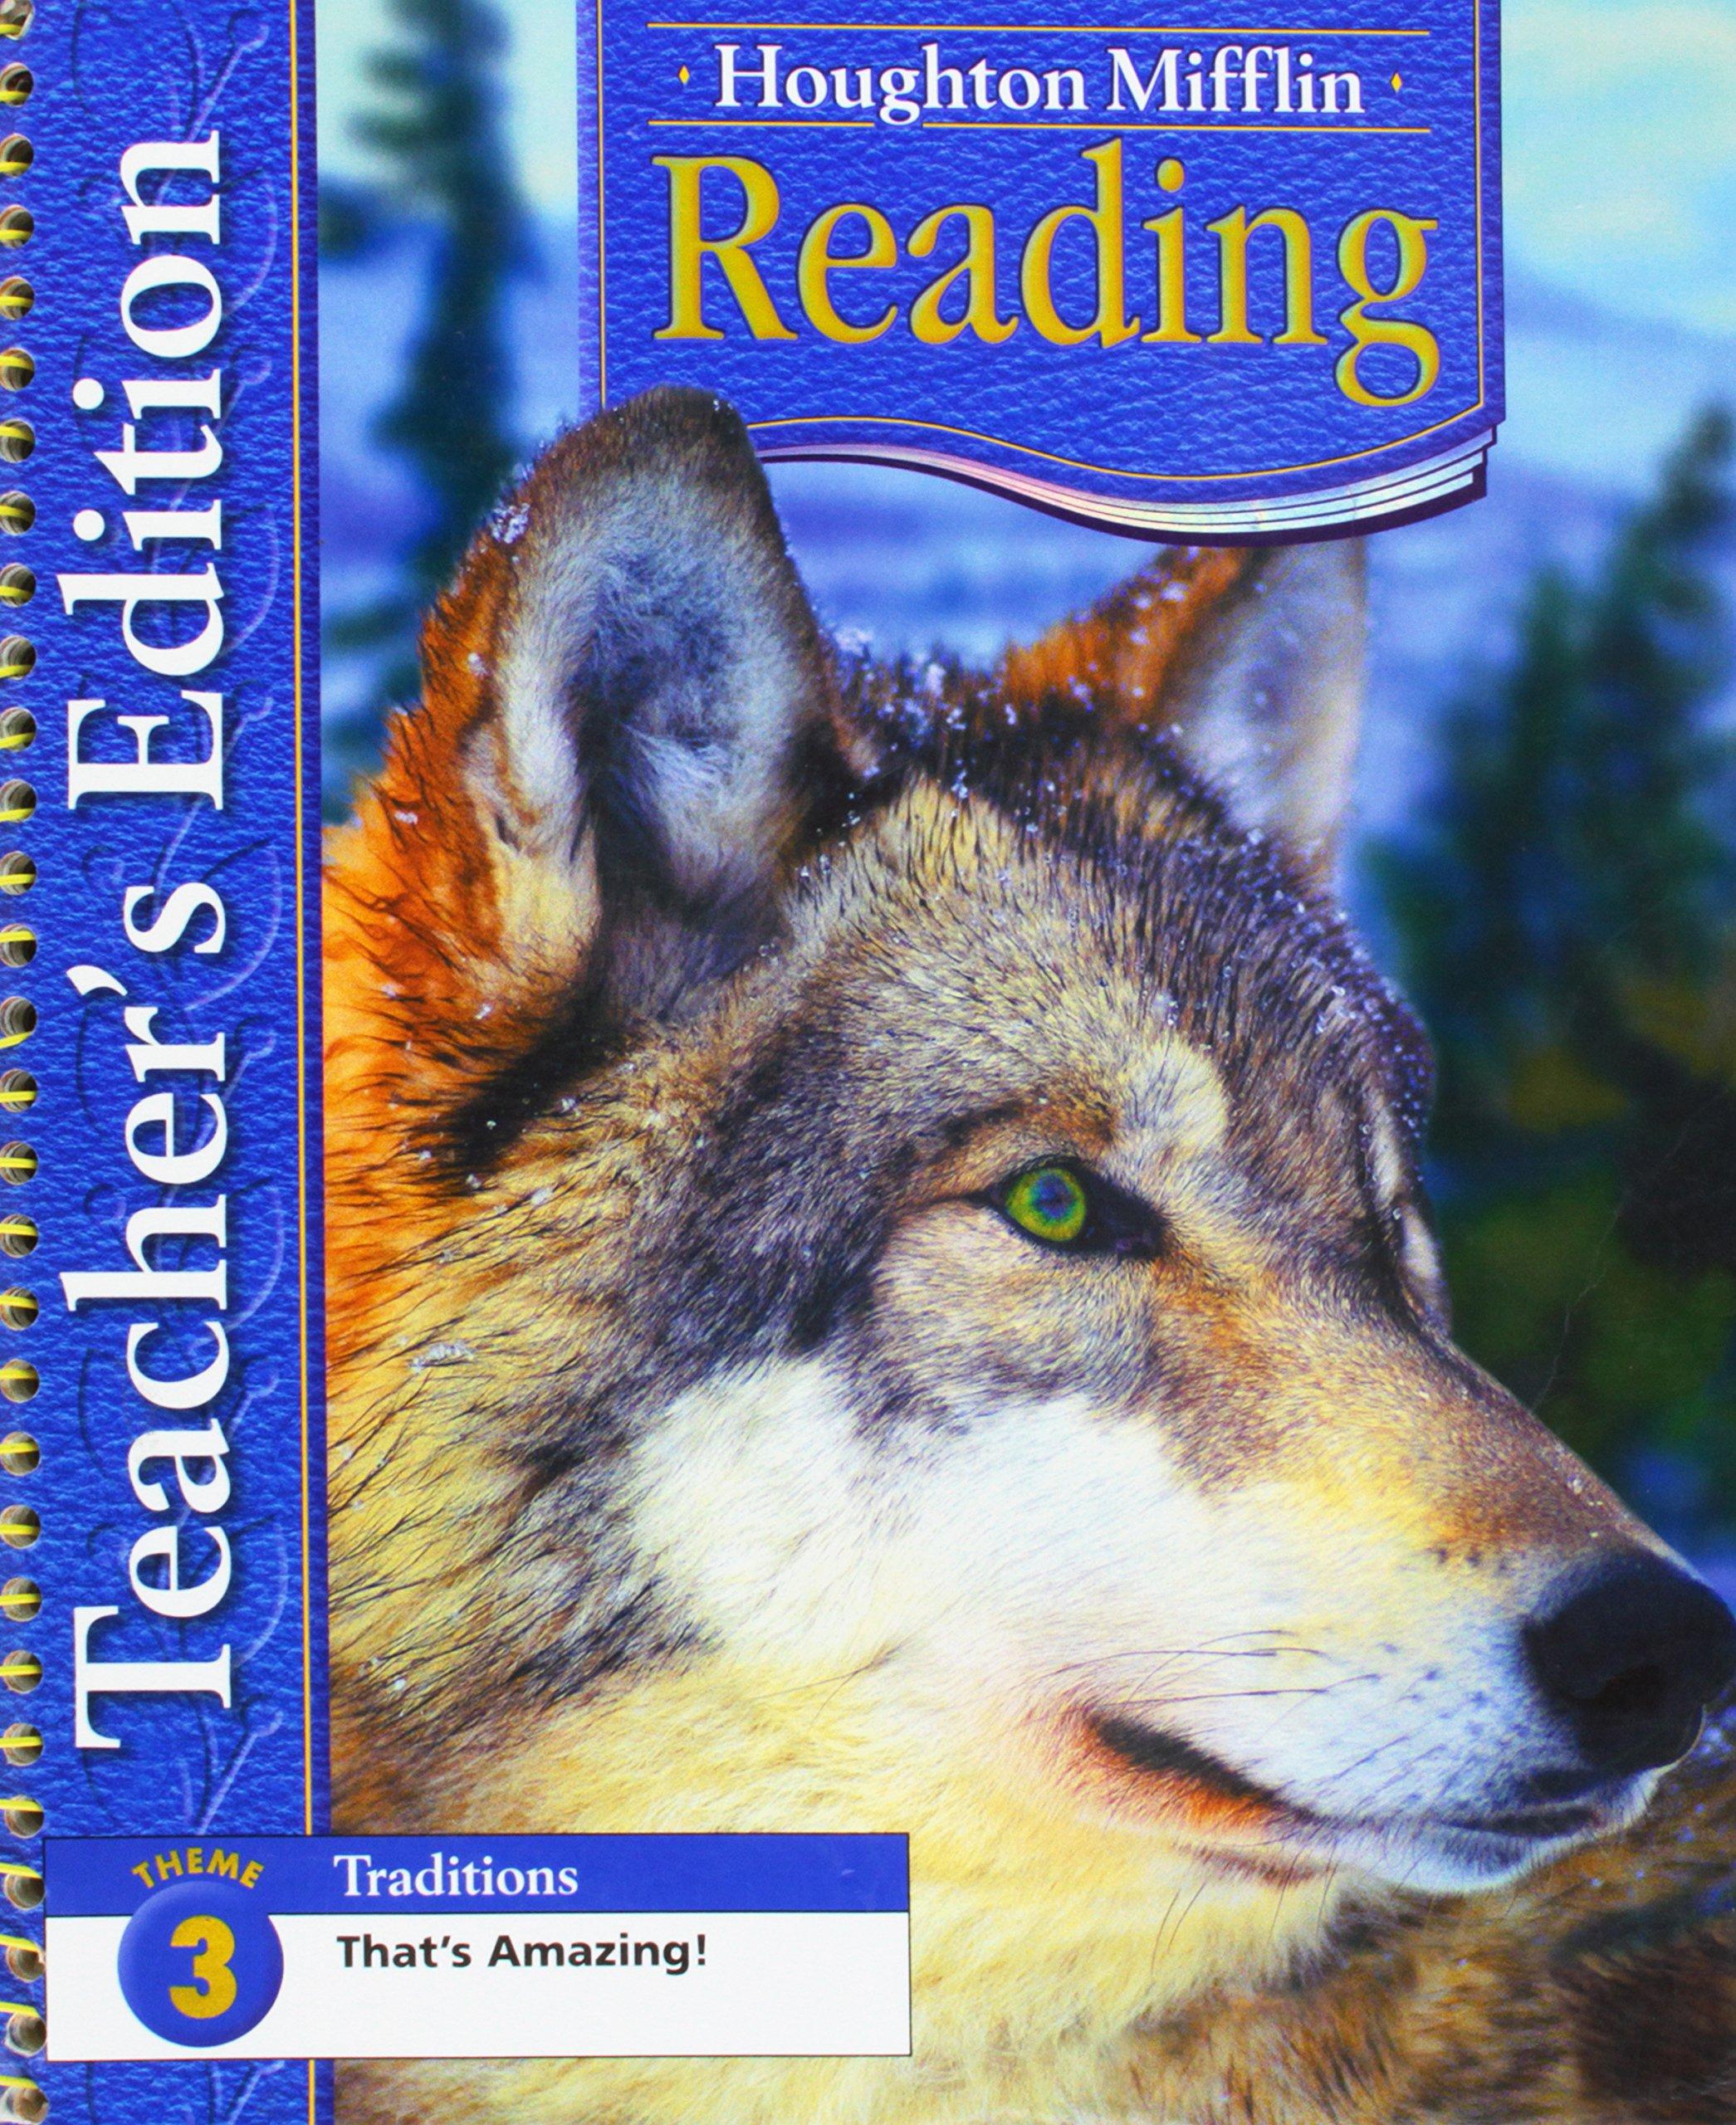 Houghton Mifflin Reading: Teacher's Edition Grade 4 Theme 3 2005 pdf epub